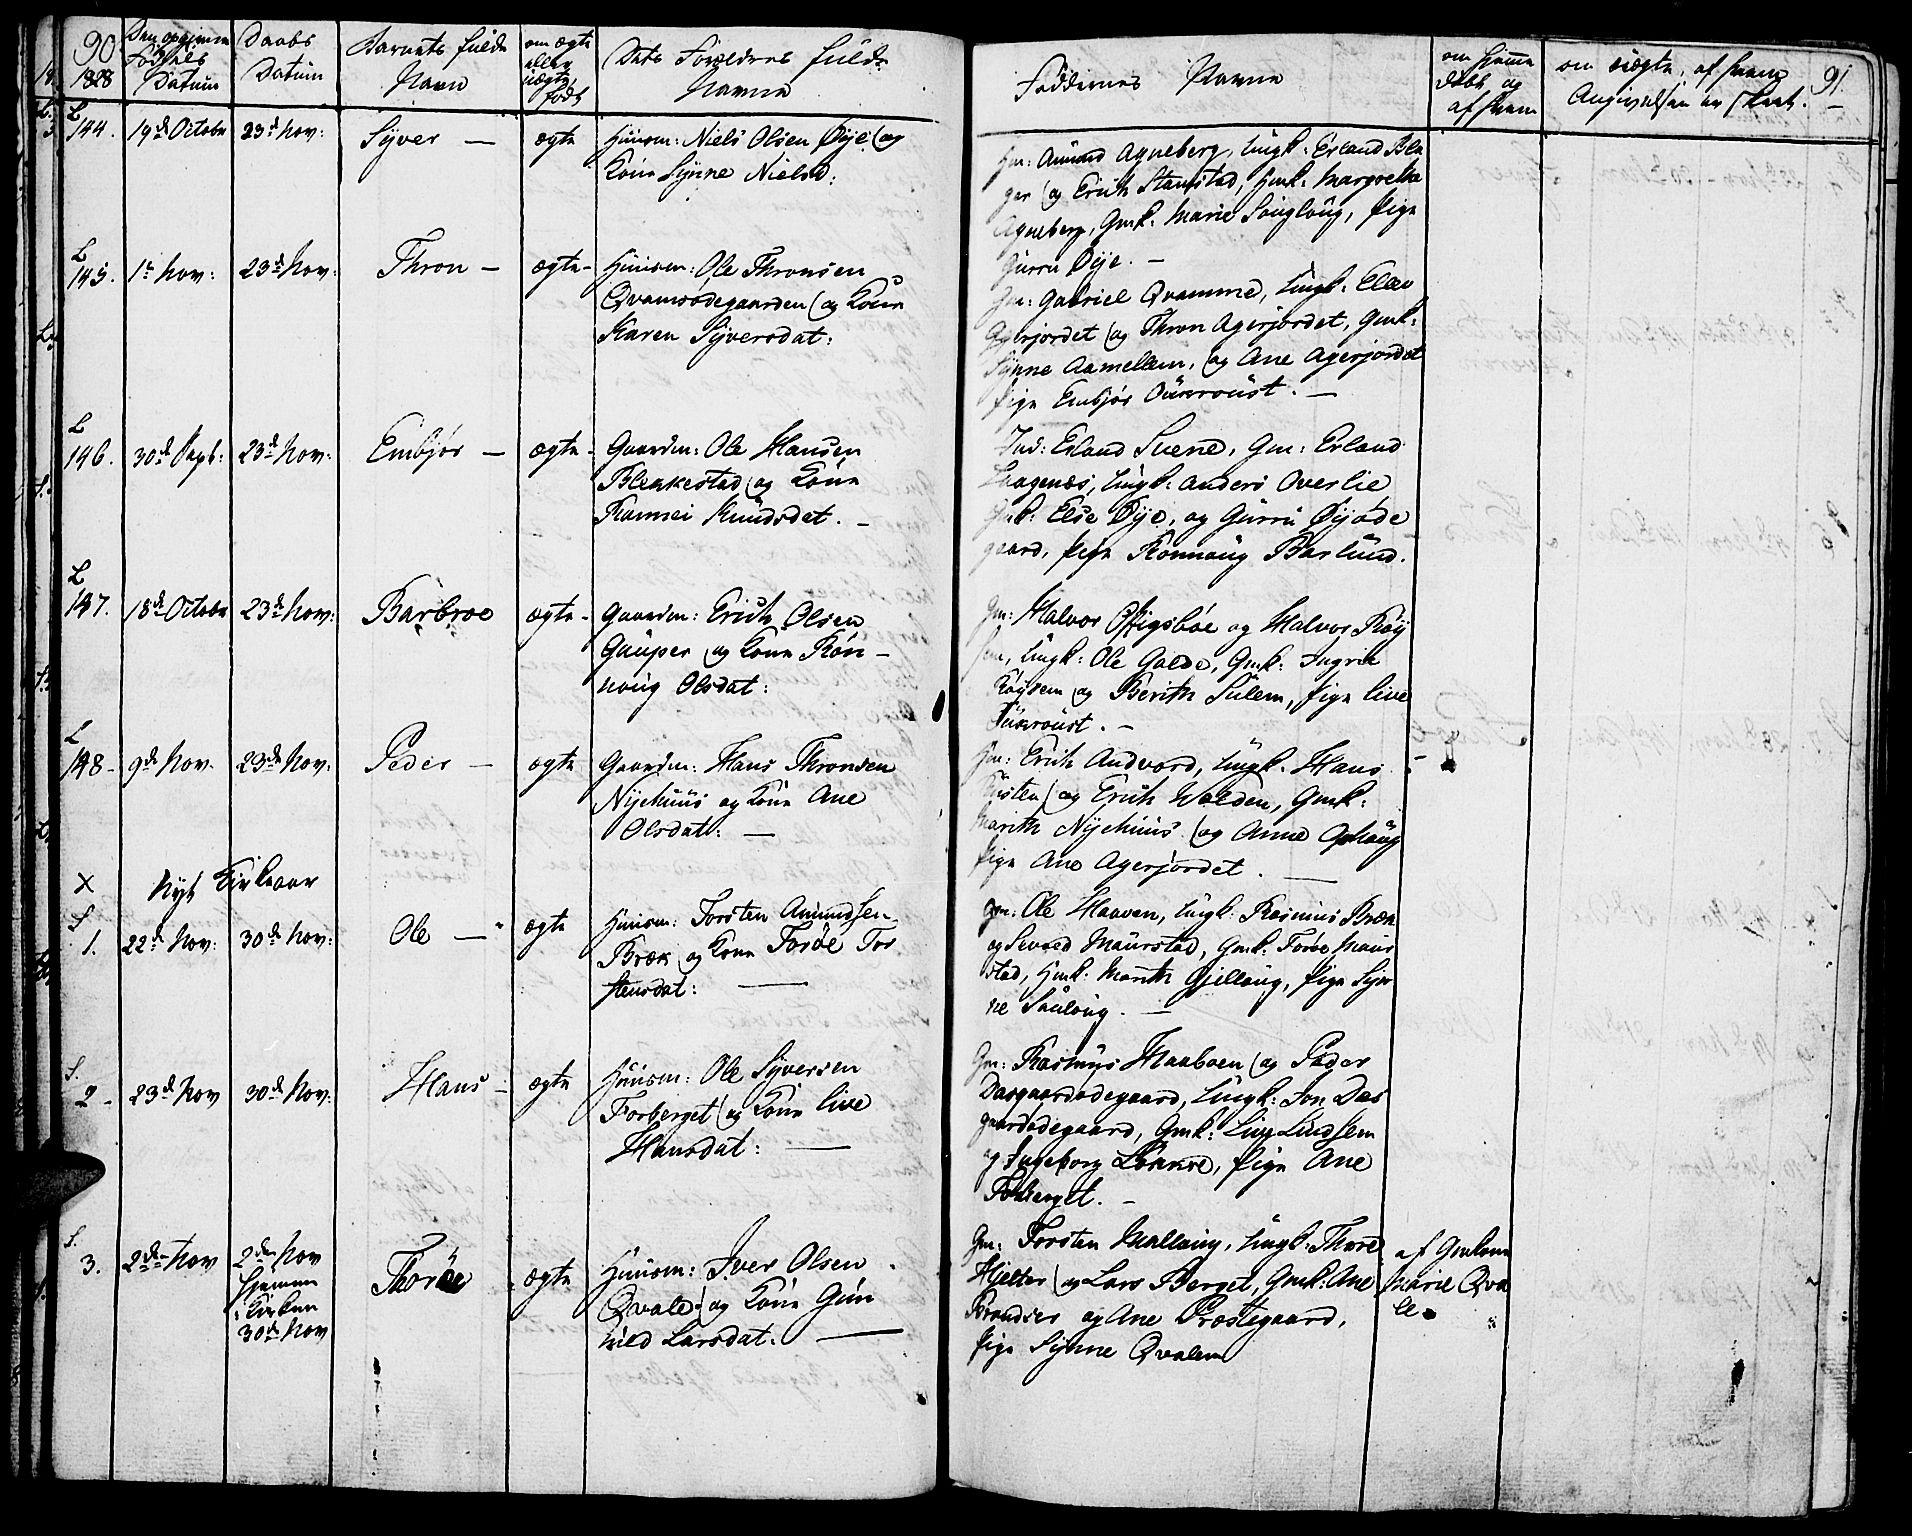 SAH, Lom prestekontor, K/L0005: Parish register (official) no. 5, 1825-1837, p. 90-91